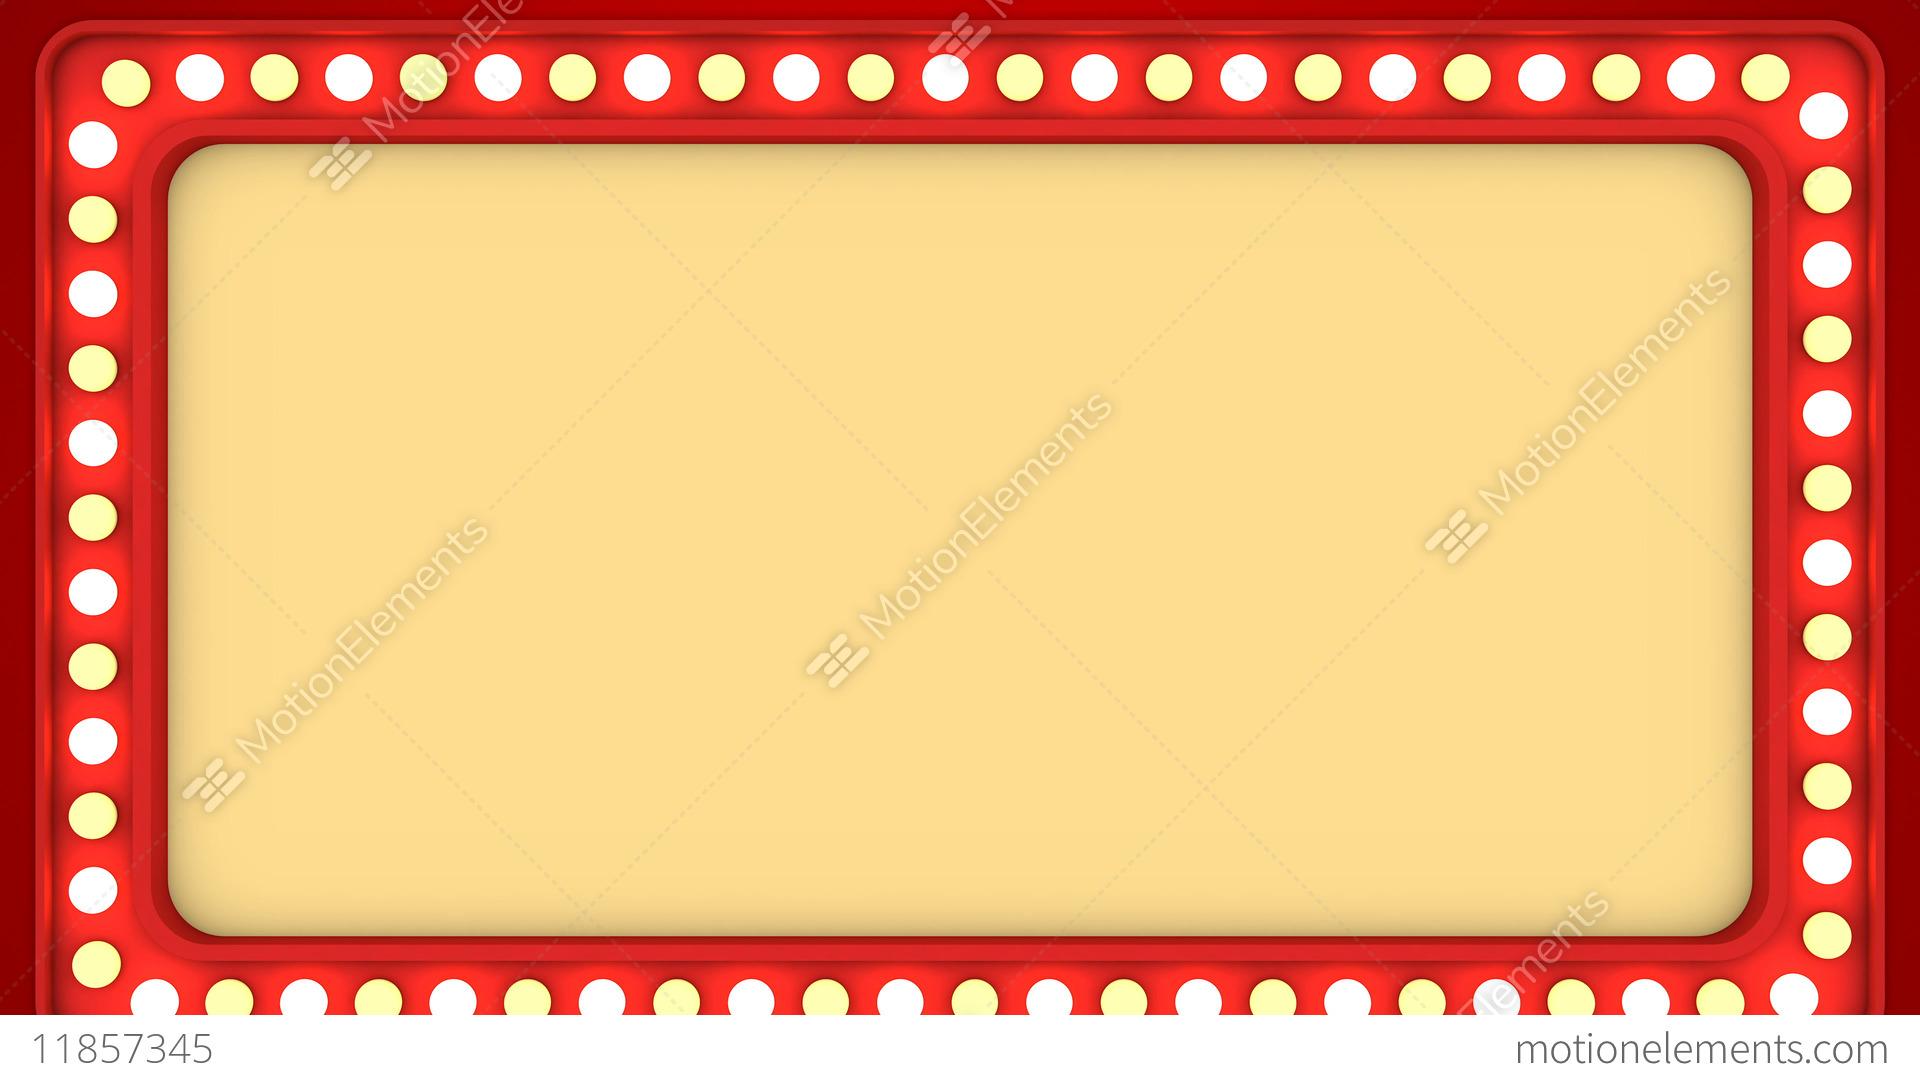 Flashing Light Bulbs Red Frame Border Screen Sign Casino